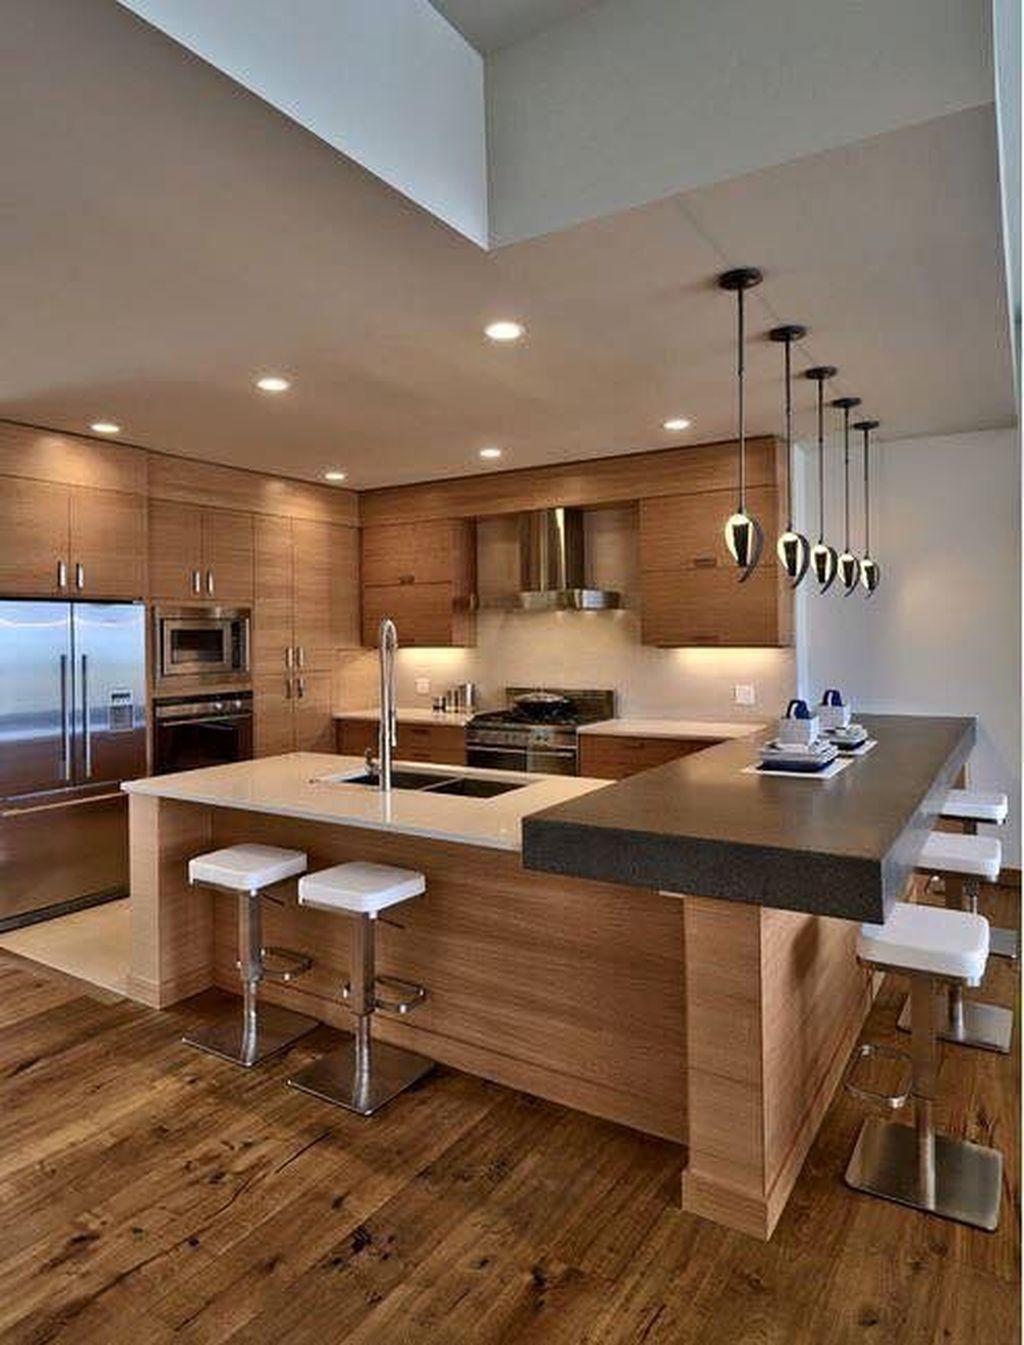 The Best Contemporary Modern Interior Design Ideas